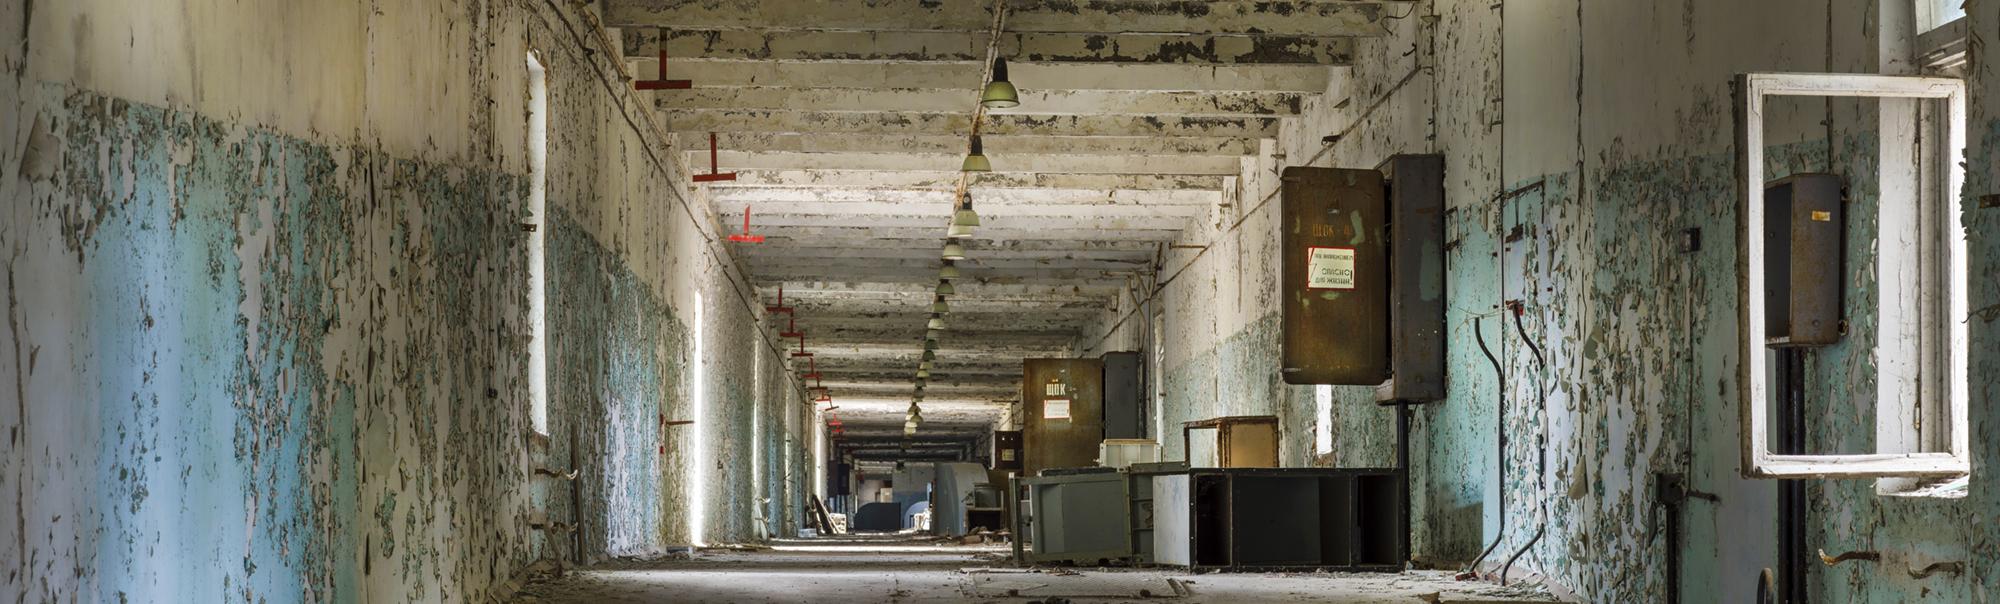 Tjernobyl 2, inside the main building near the Duga